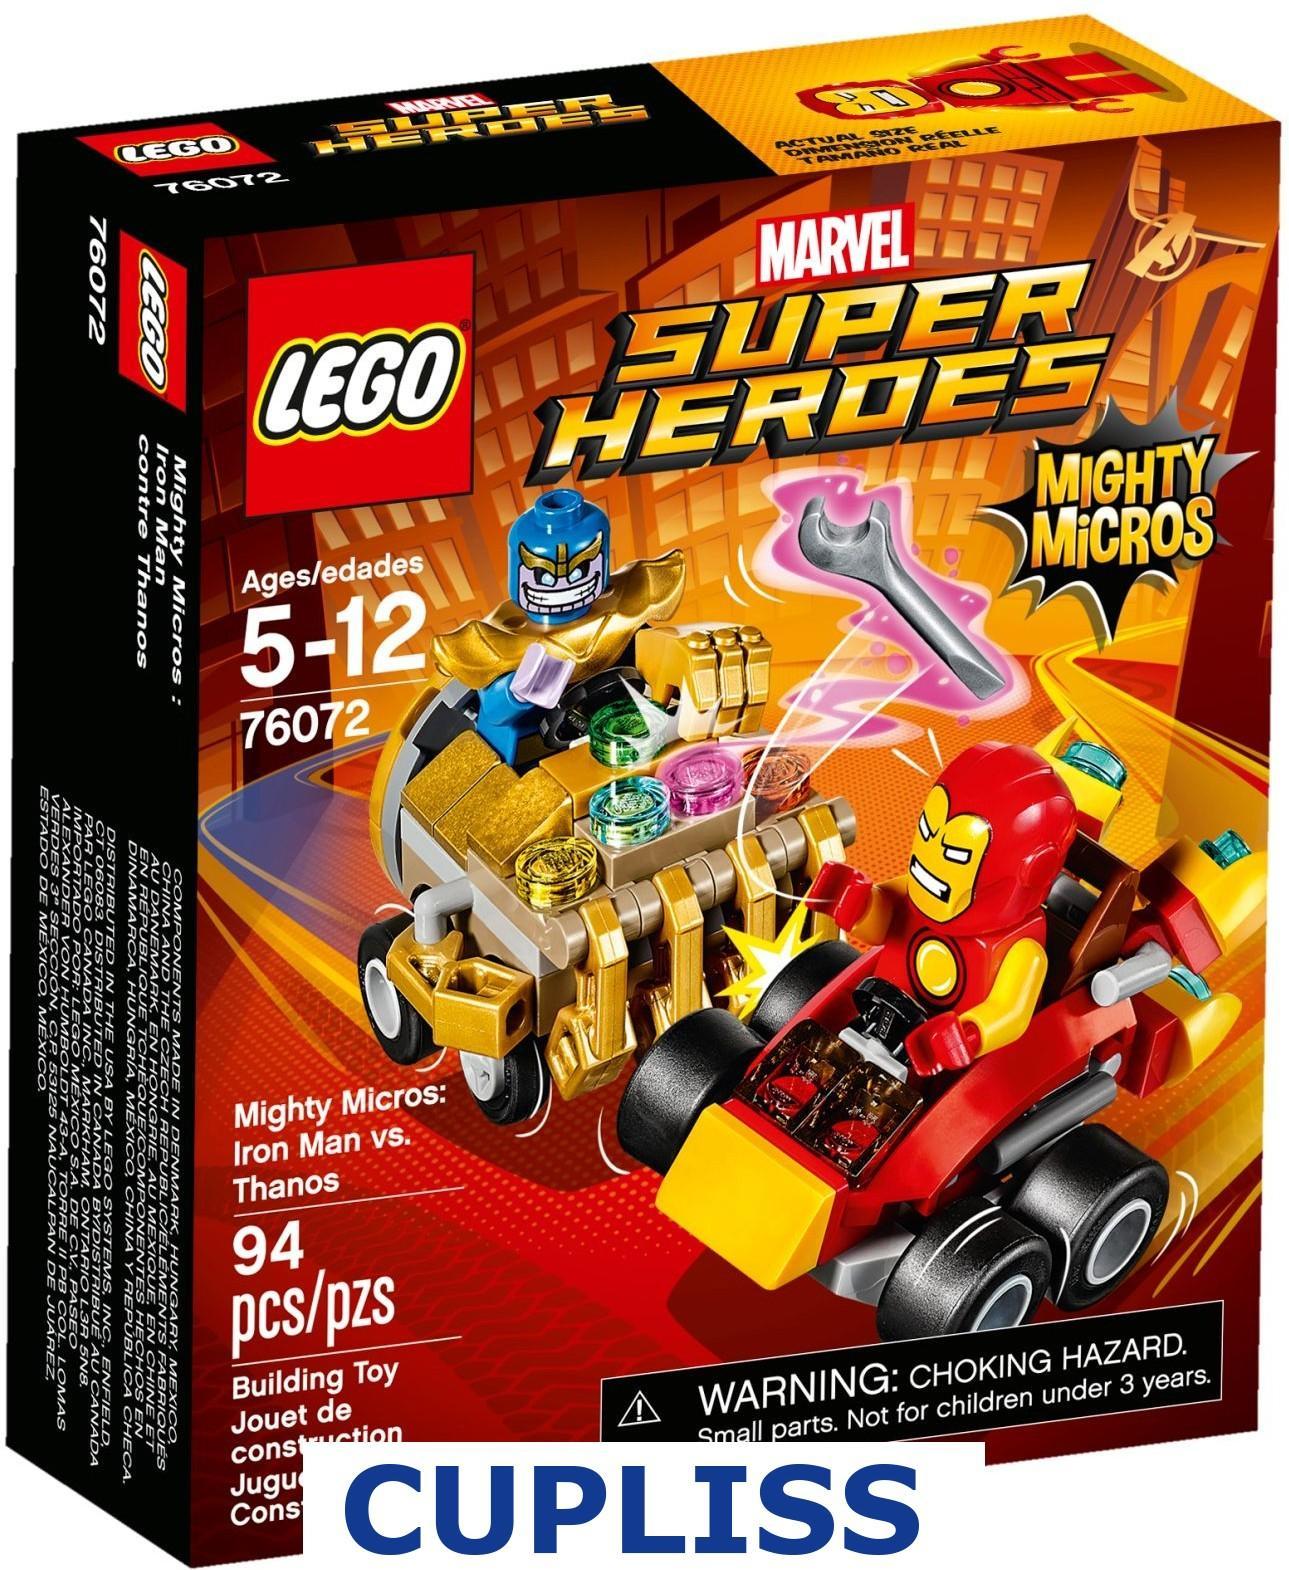 LEGO Superheroes 76072 Mighty Micros Iron Man vs Thanos Marvel